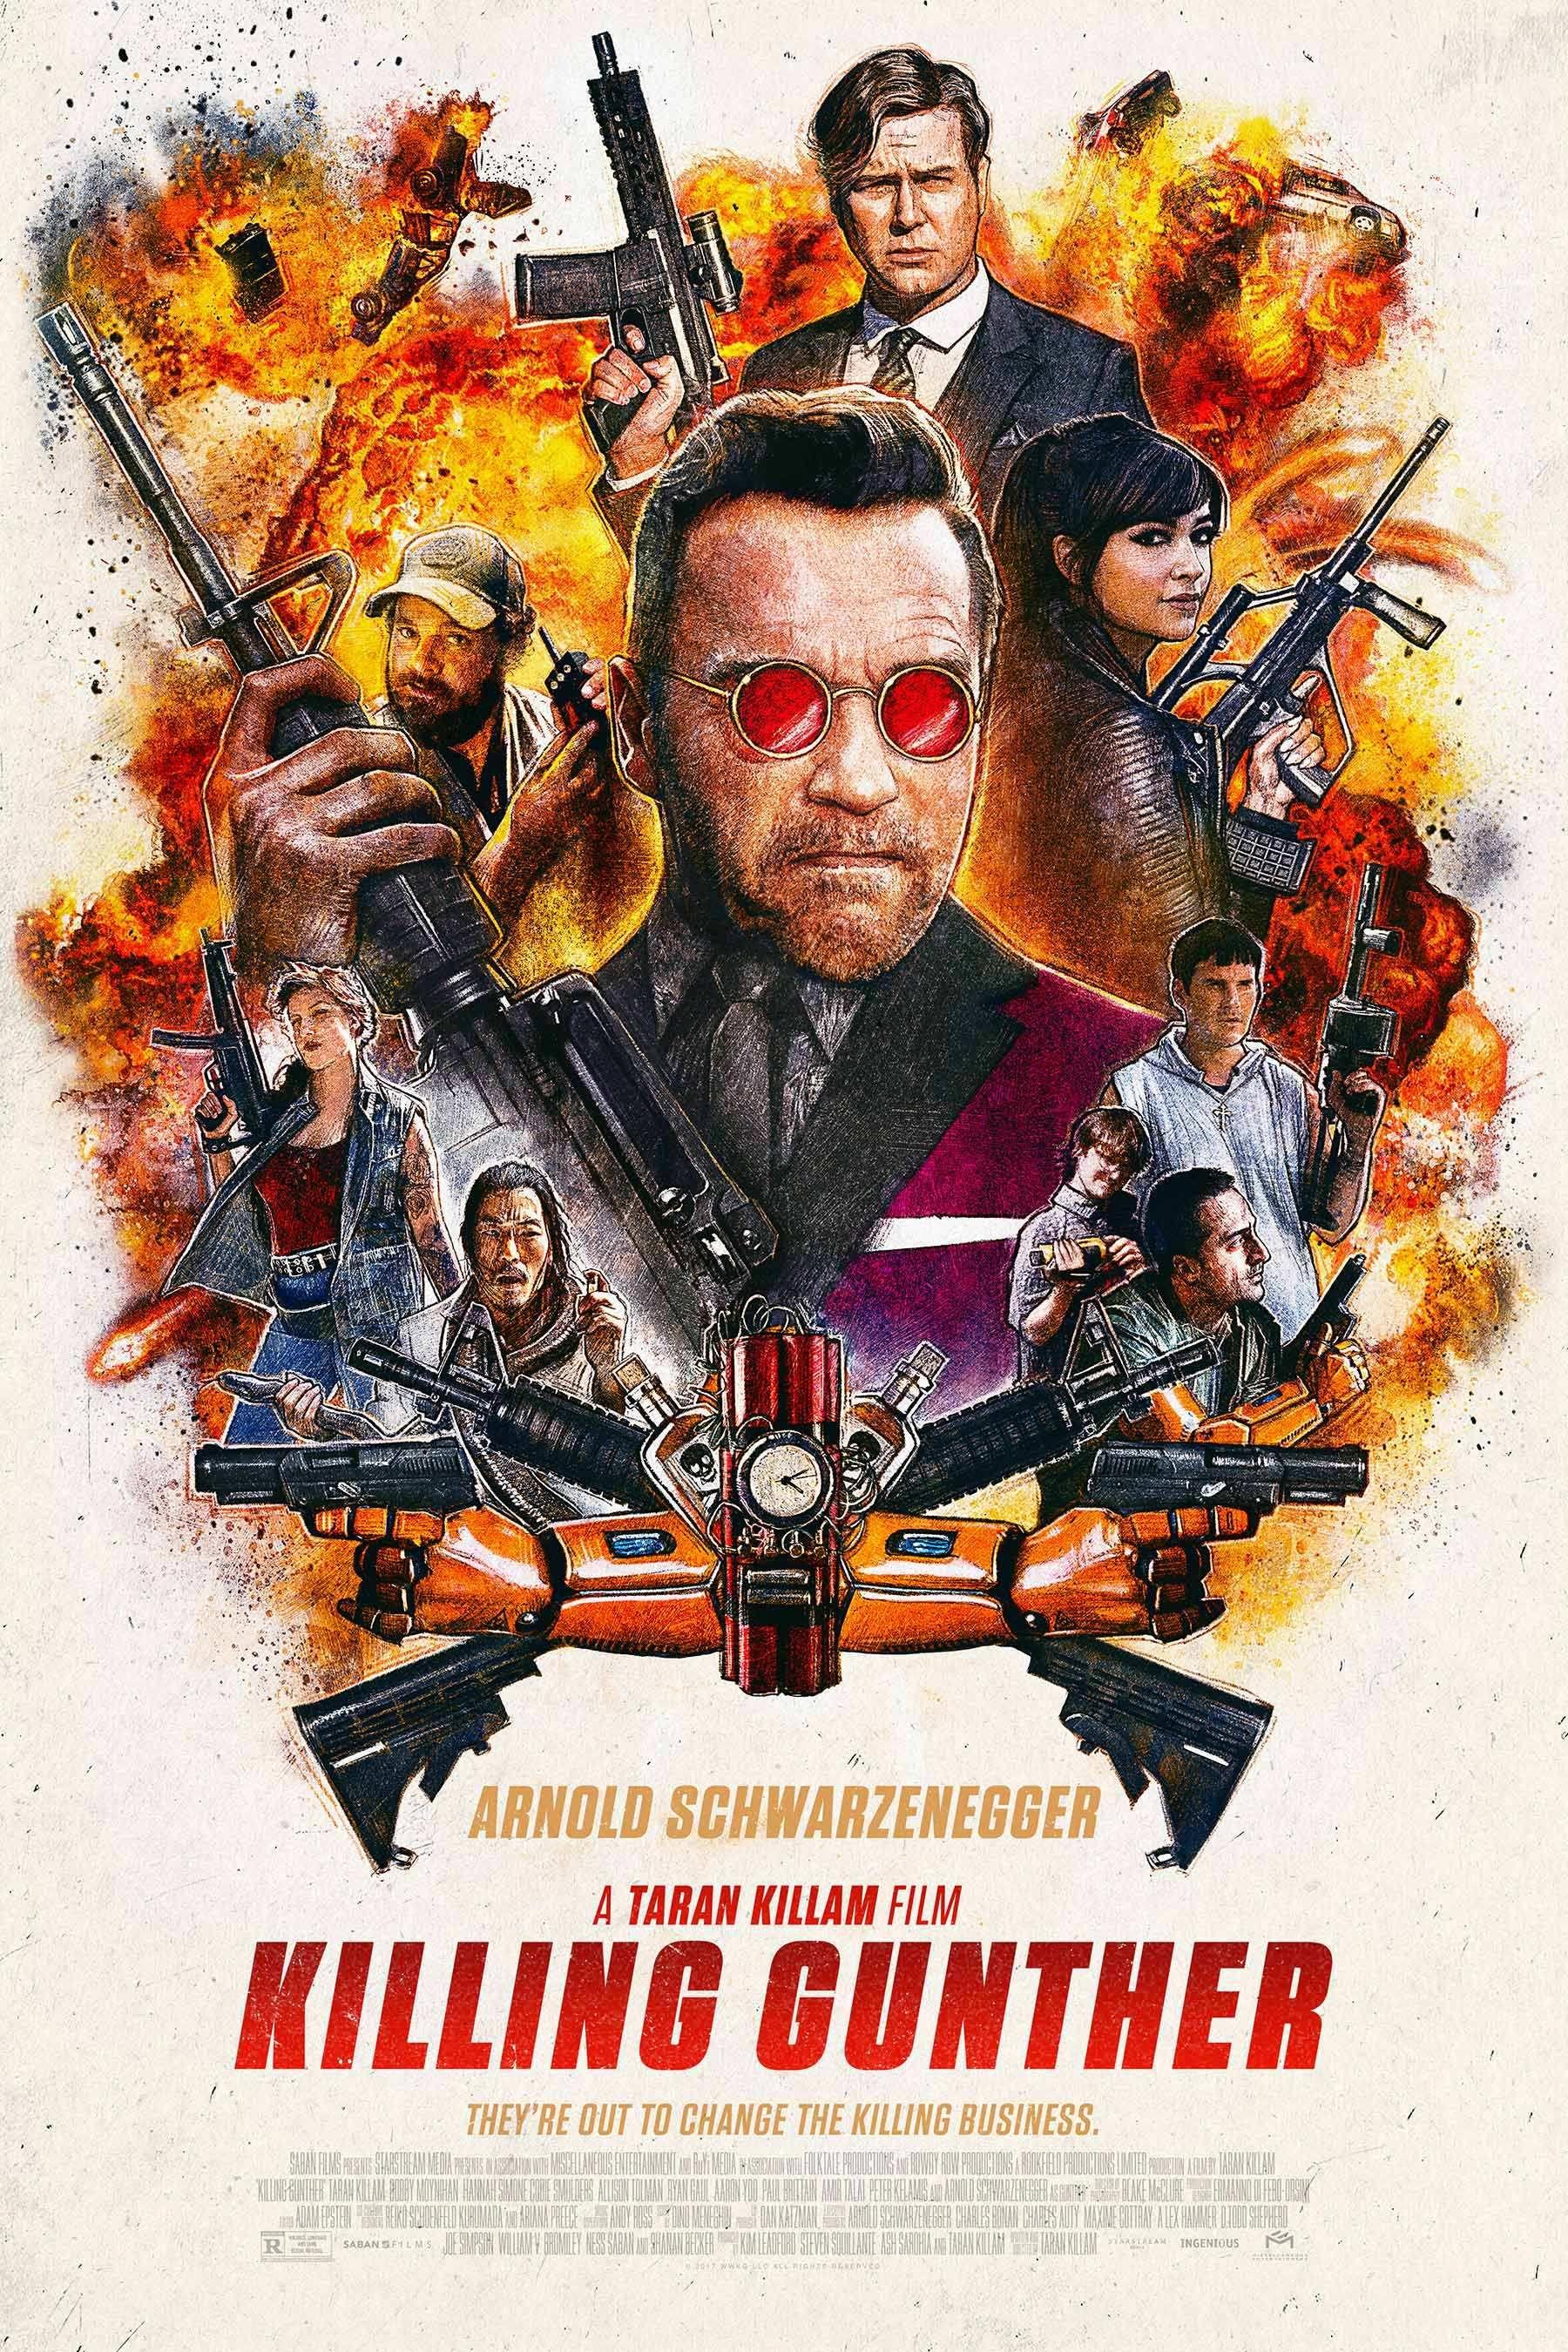 The Mockumenary Killing Gunther Pits Assassins Against Arnold Schwarzenegger